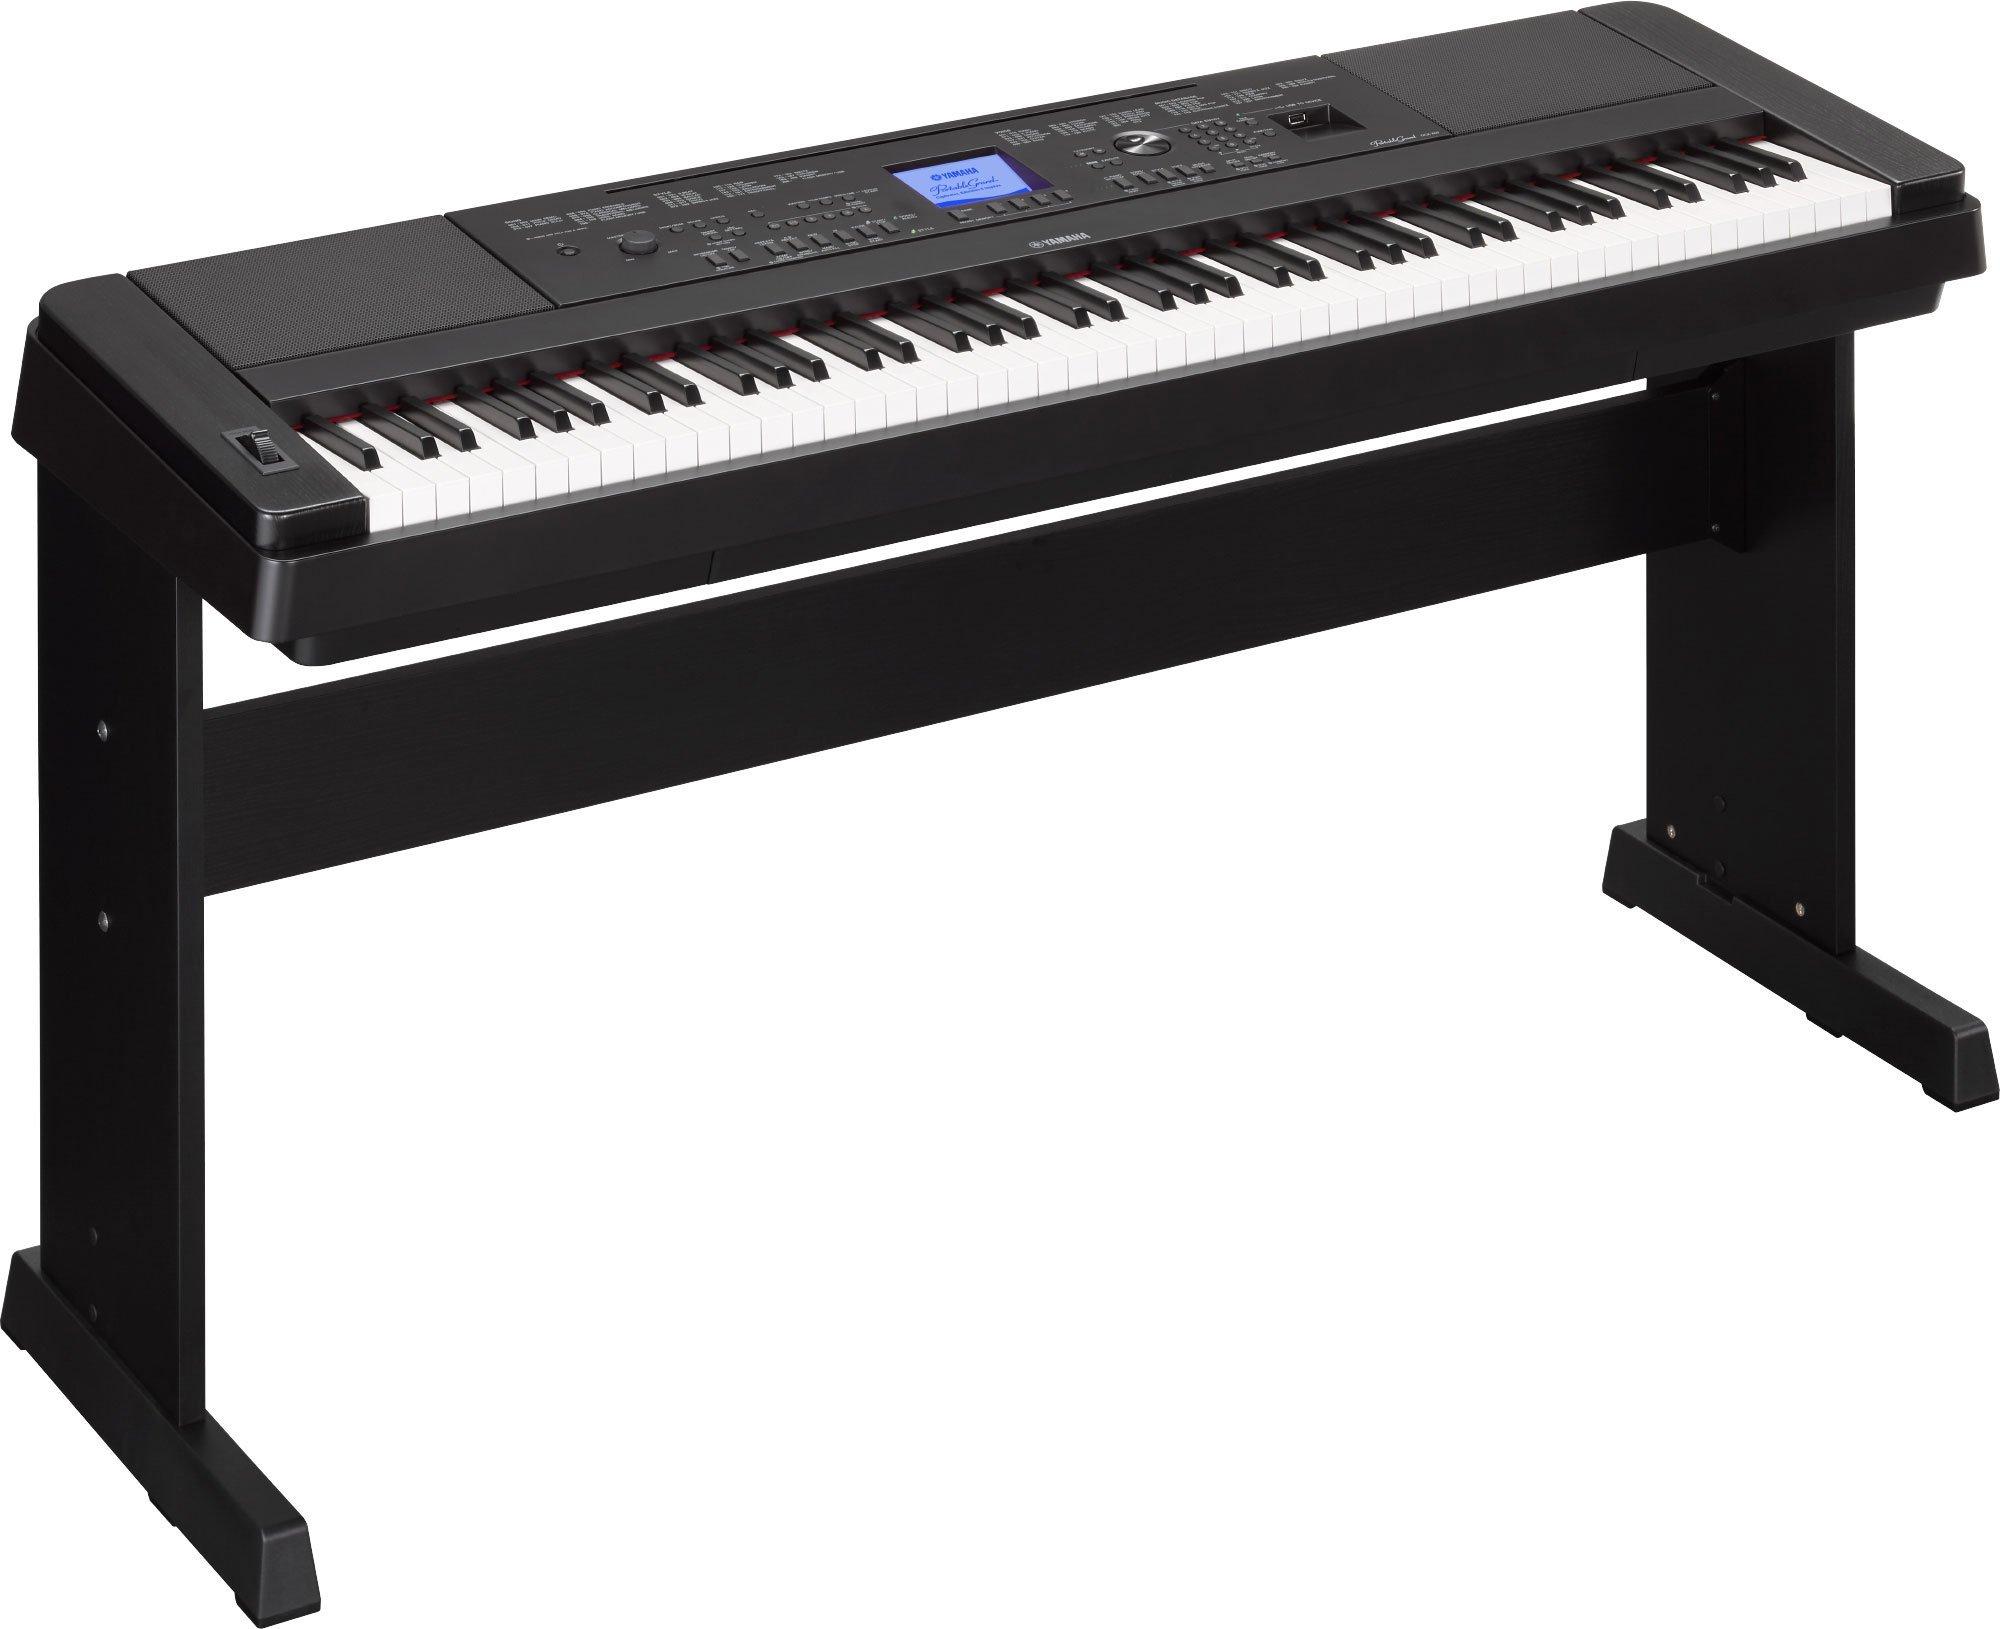 Yamaha DGX660 Digital Piano Education Bundle, Black with Yamaha BB1 Bench and Dust Cover by YAMAHA (Image #2)